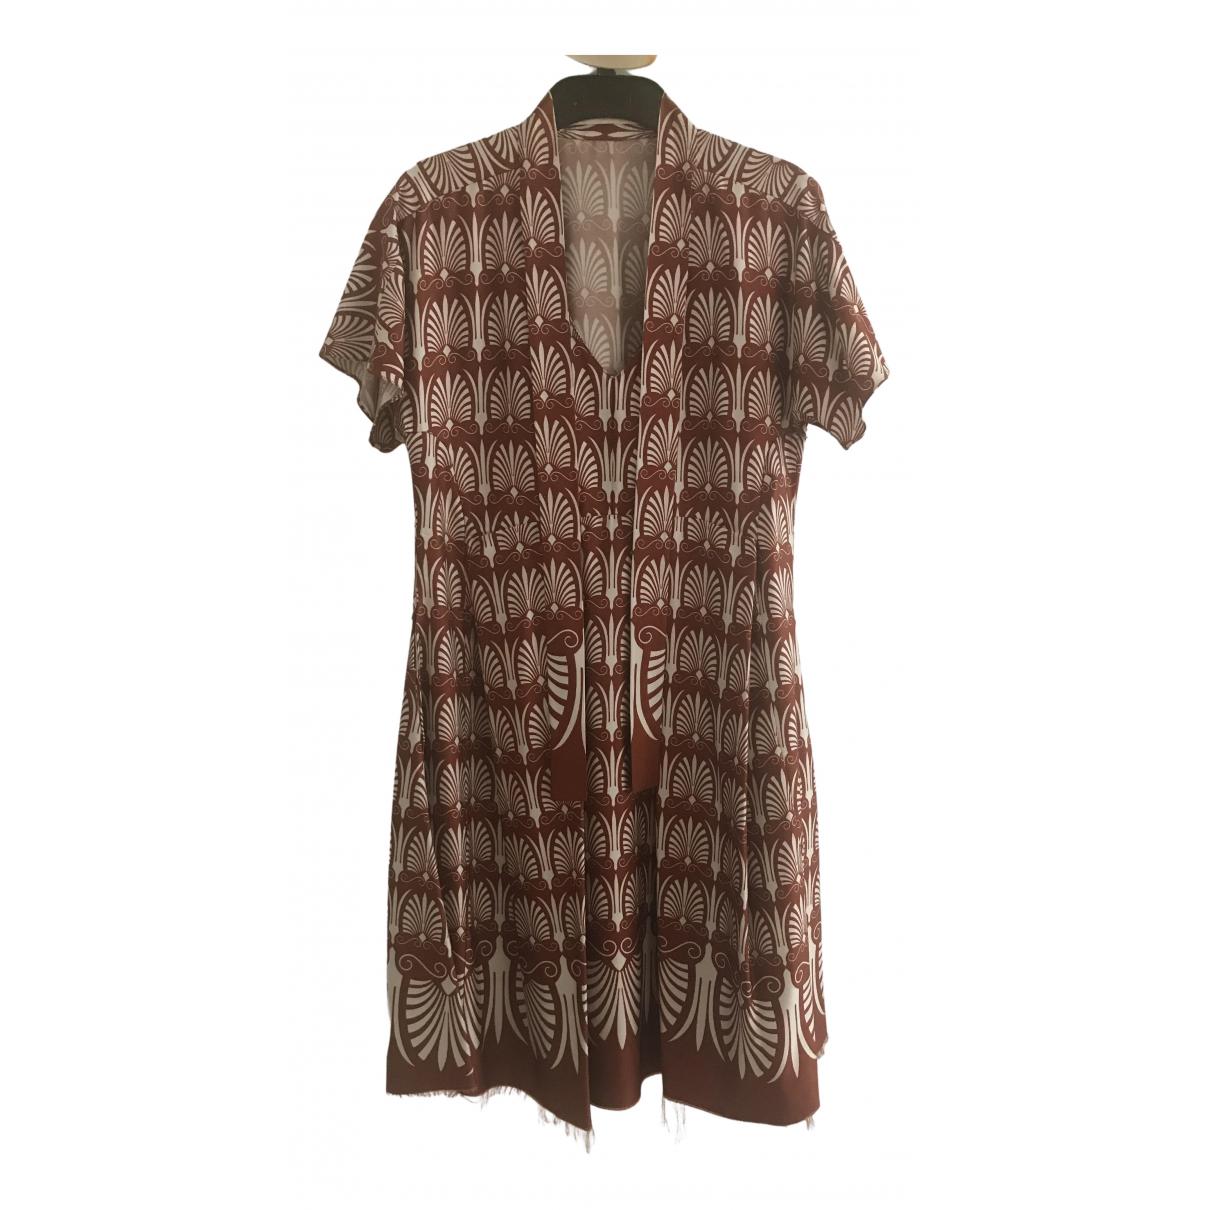 Marni \N Kleid in  Braun Synthetik